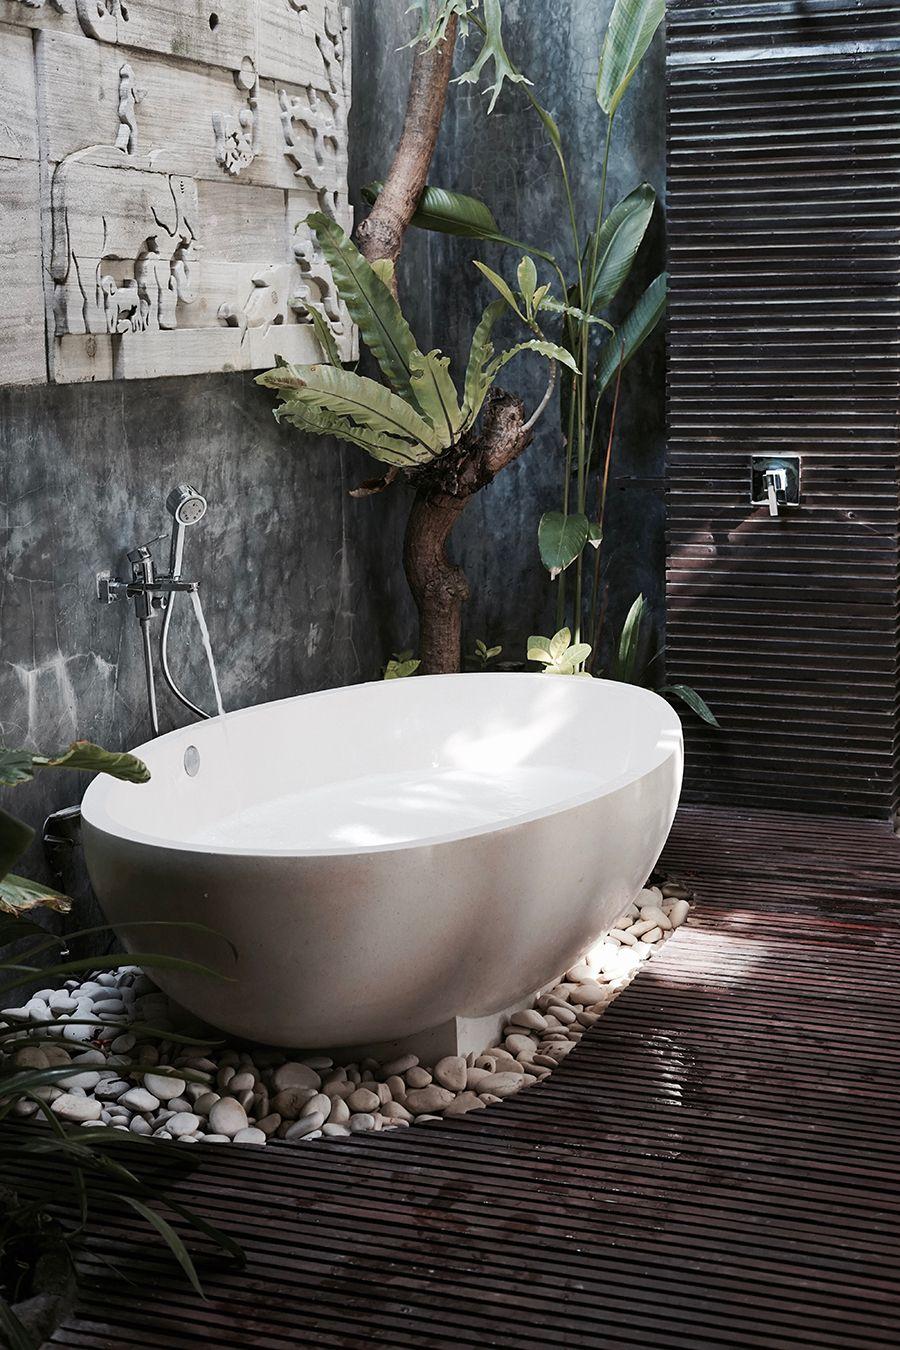 bali bathroom inspiration                                                                                                                                                                                 More